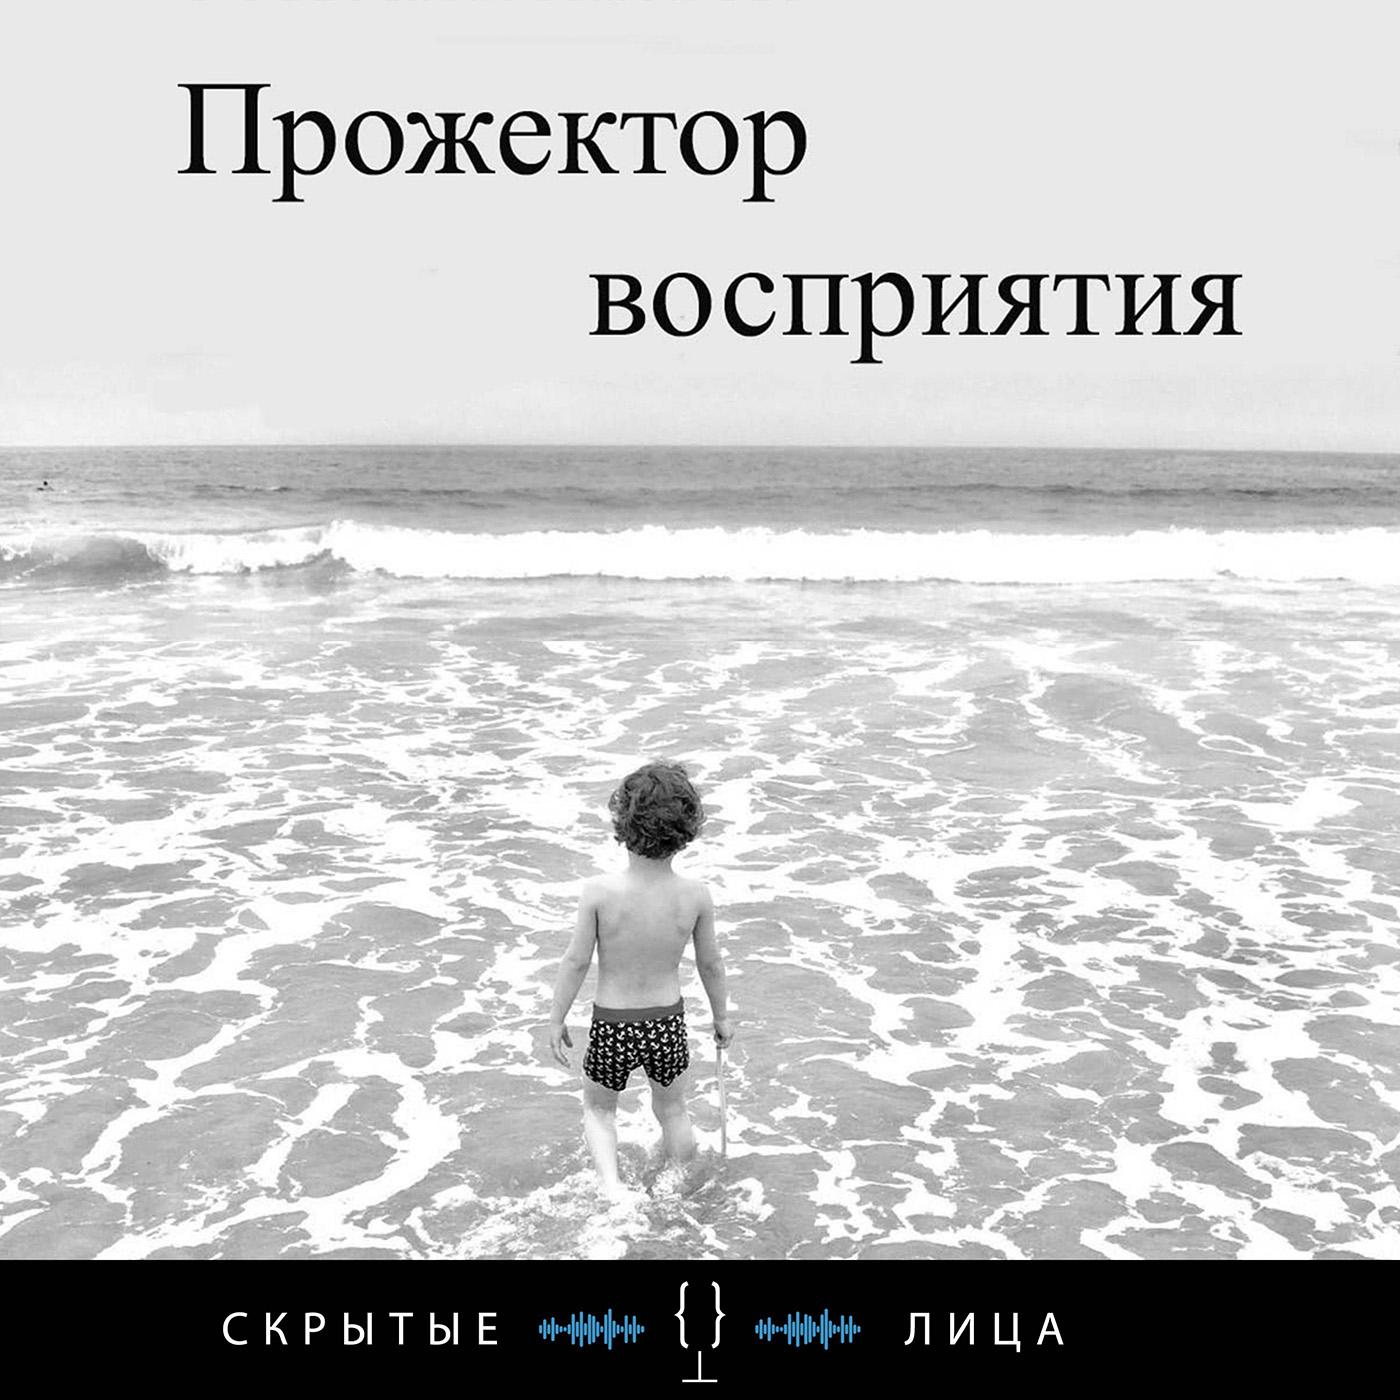 Владимир Марковский Пьяная обезьяна цены